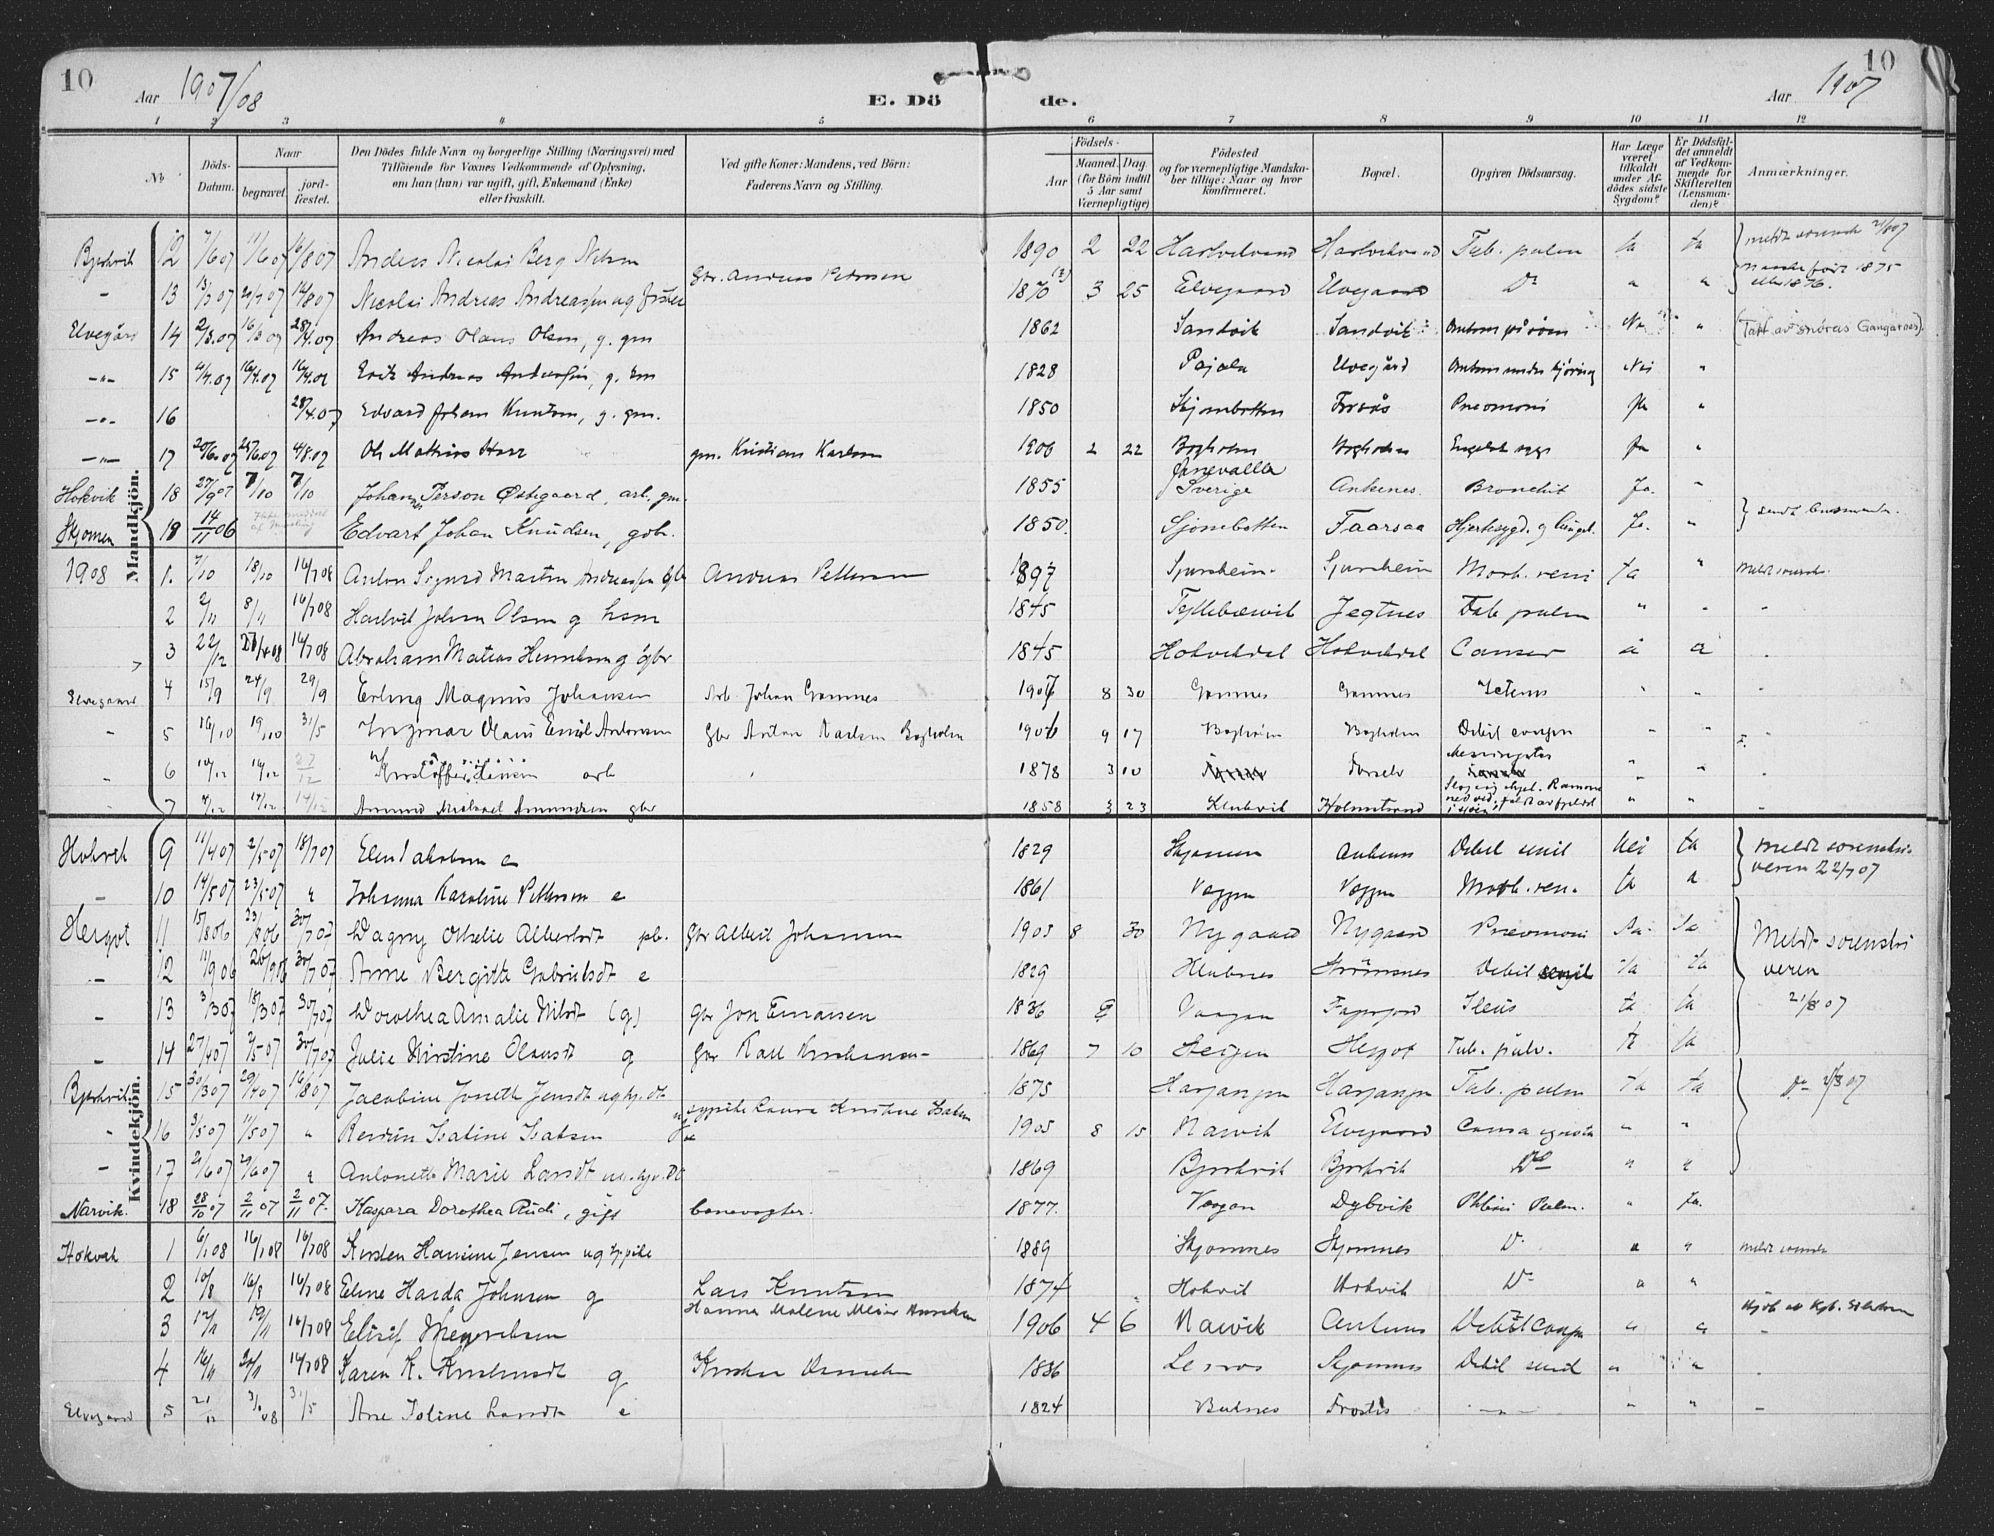 SAT, Ministerialprotokoller, klokkerbøker og fødselsregistre - Nordland, 866/L0940: Ministerialbok nr. 866A03, 1902-1926, s. 10